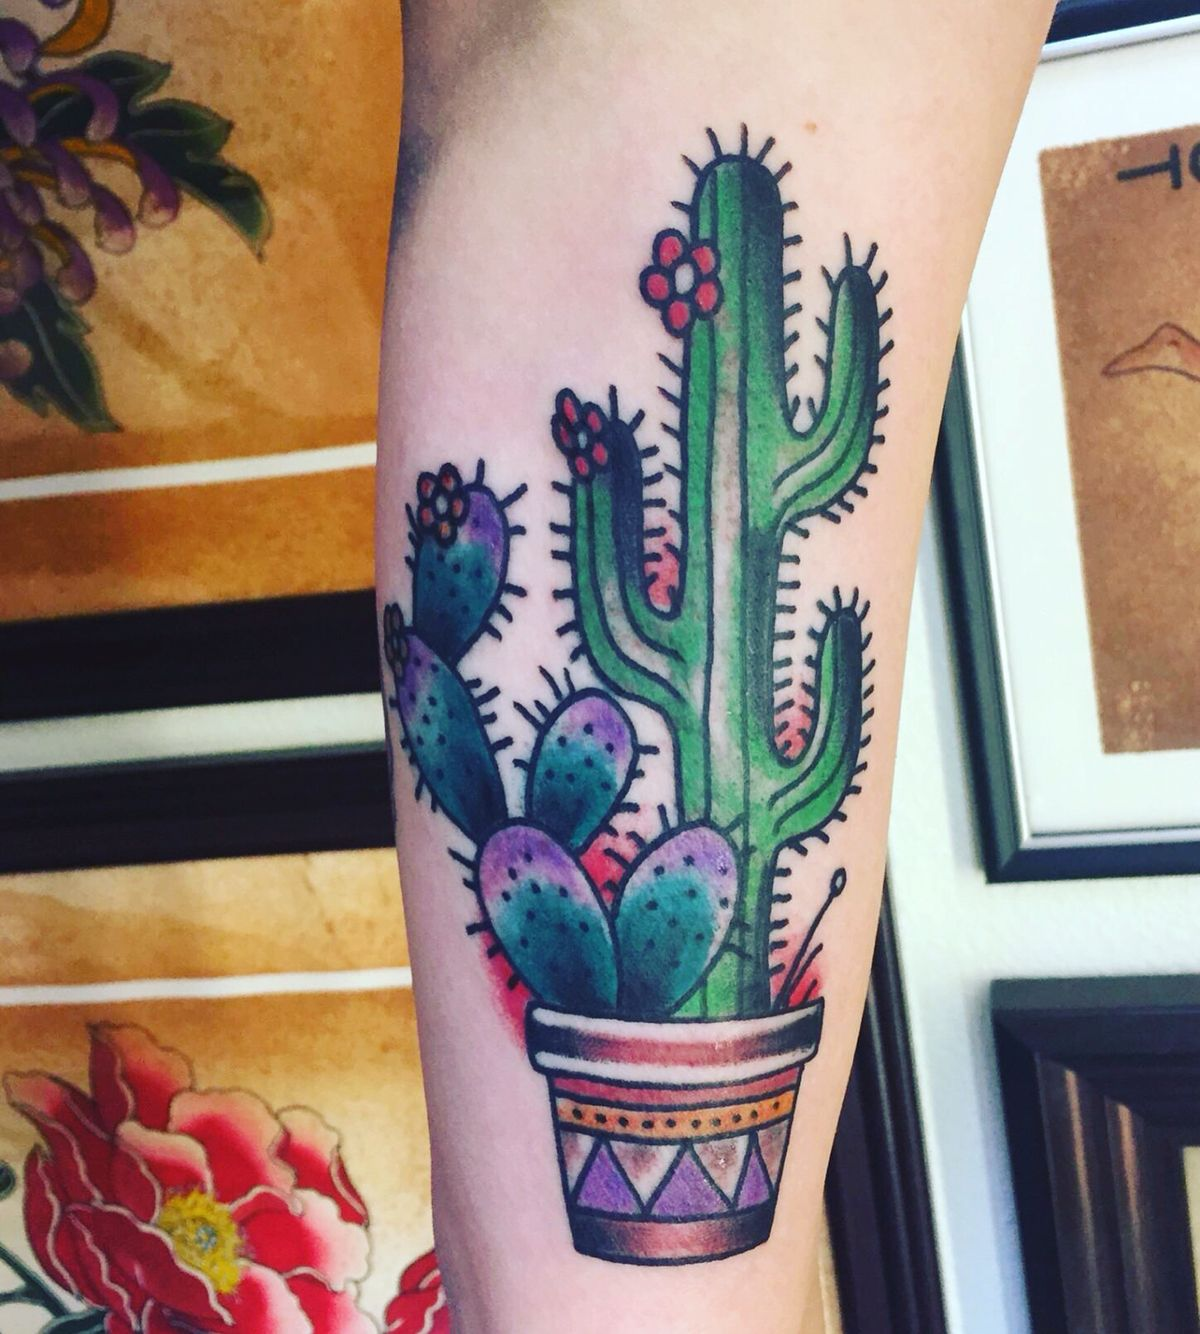 Traditional Style Cactus Tattoo Cactus Tattoo Tattoos For Guys Candle Tattoo Design